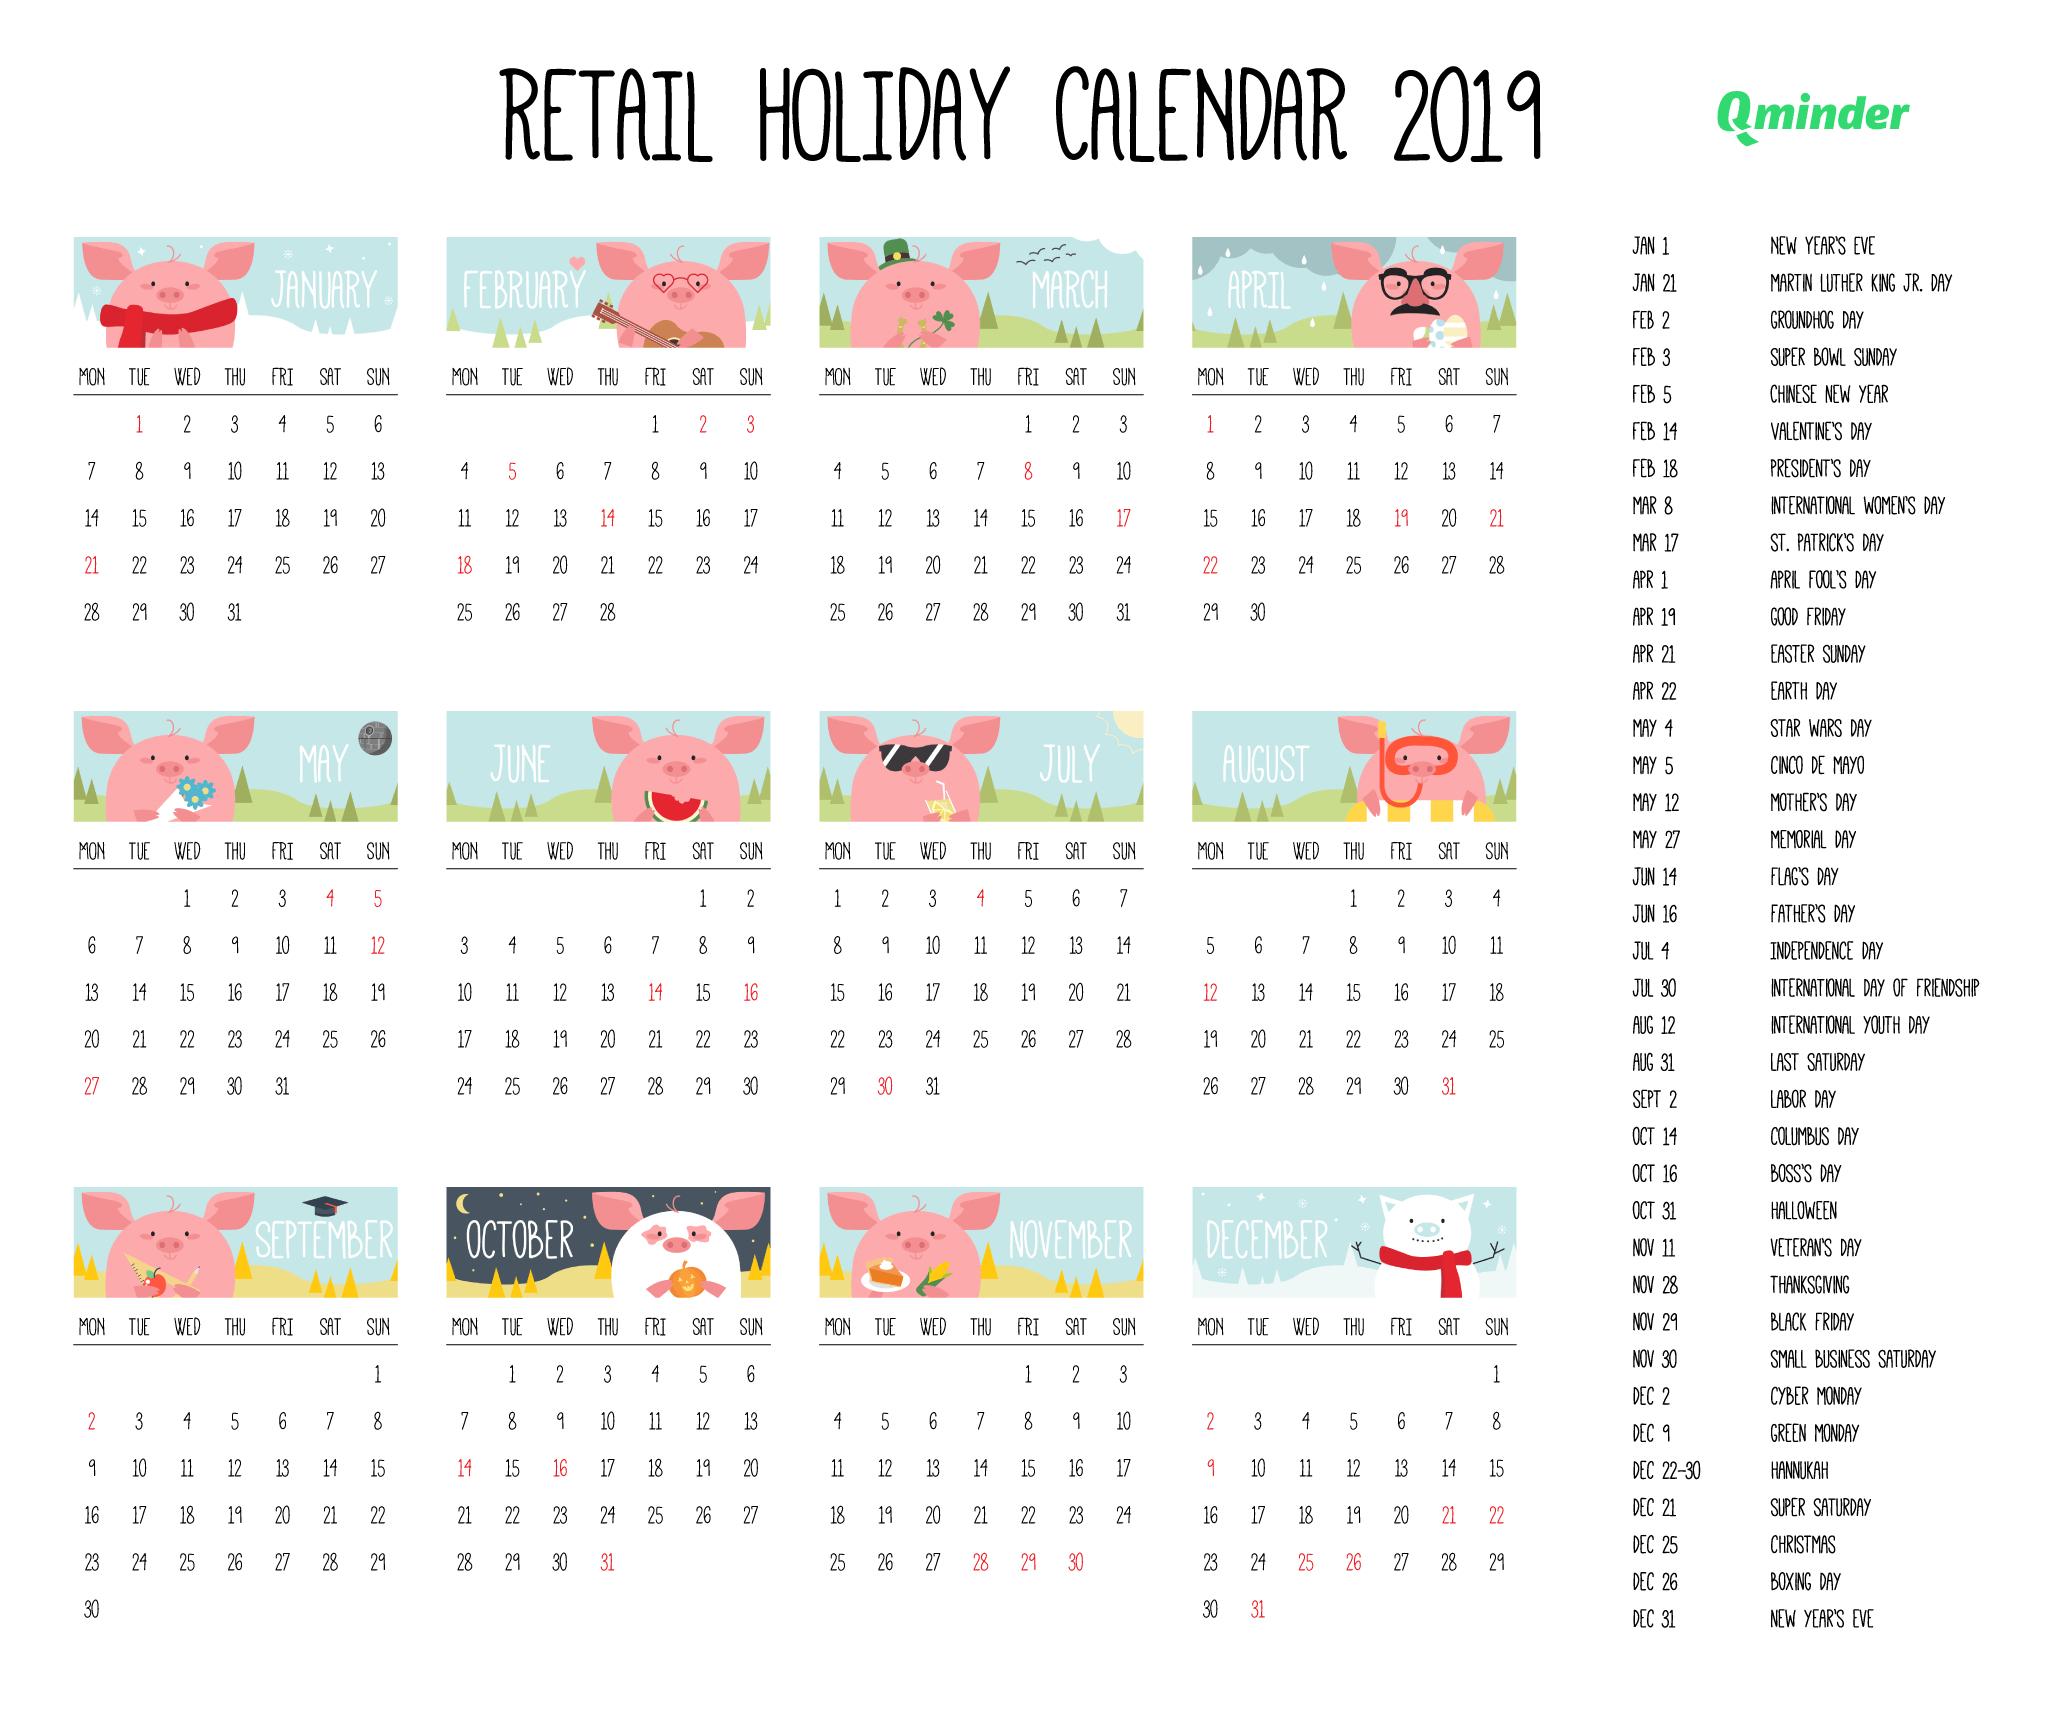 2019 Retail Holiday Calendar   Qminder Holidays On A Calendar 2019